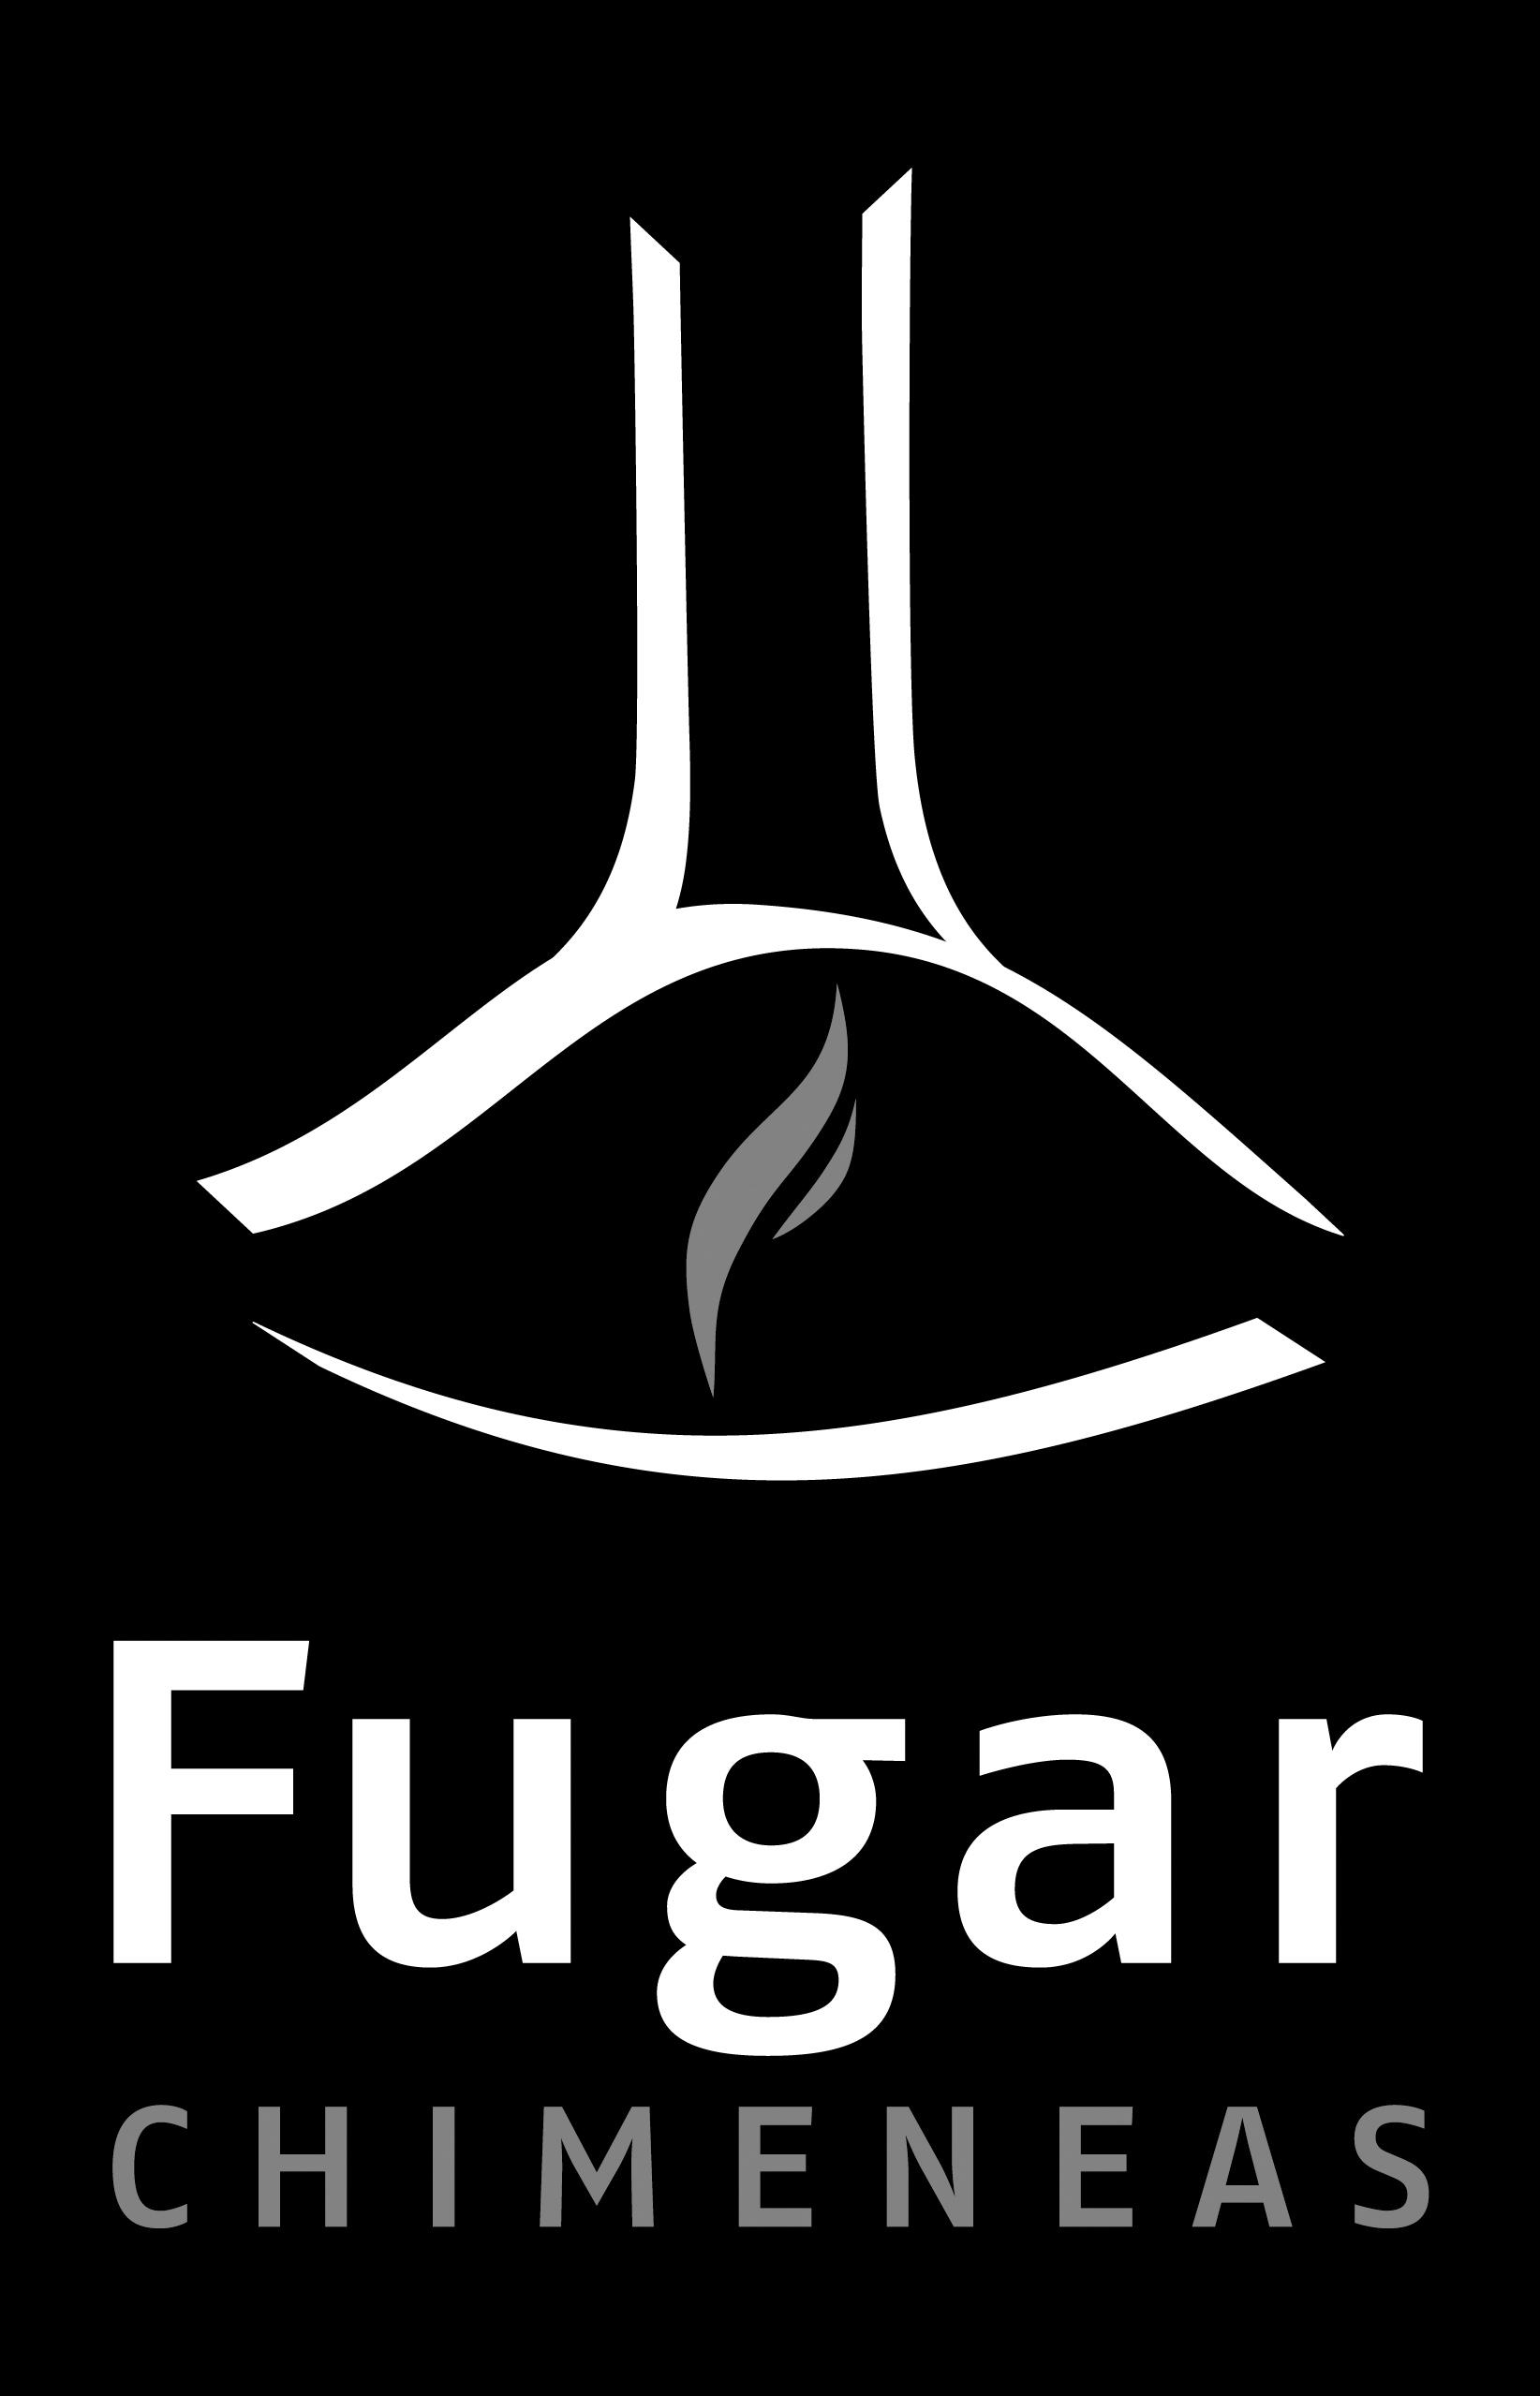 Chimeneas Fugar - Centelles